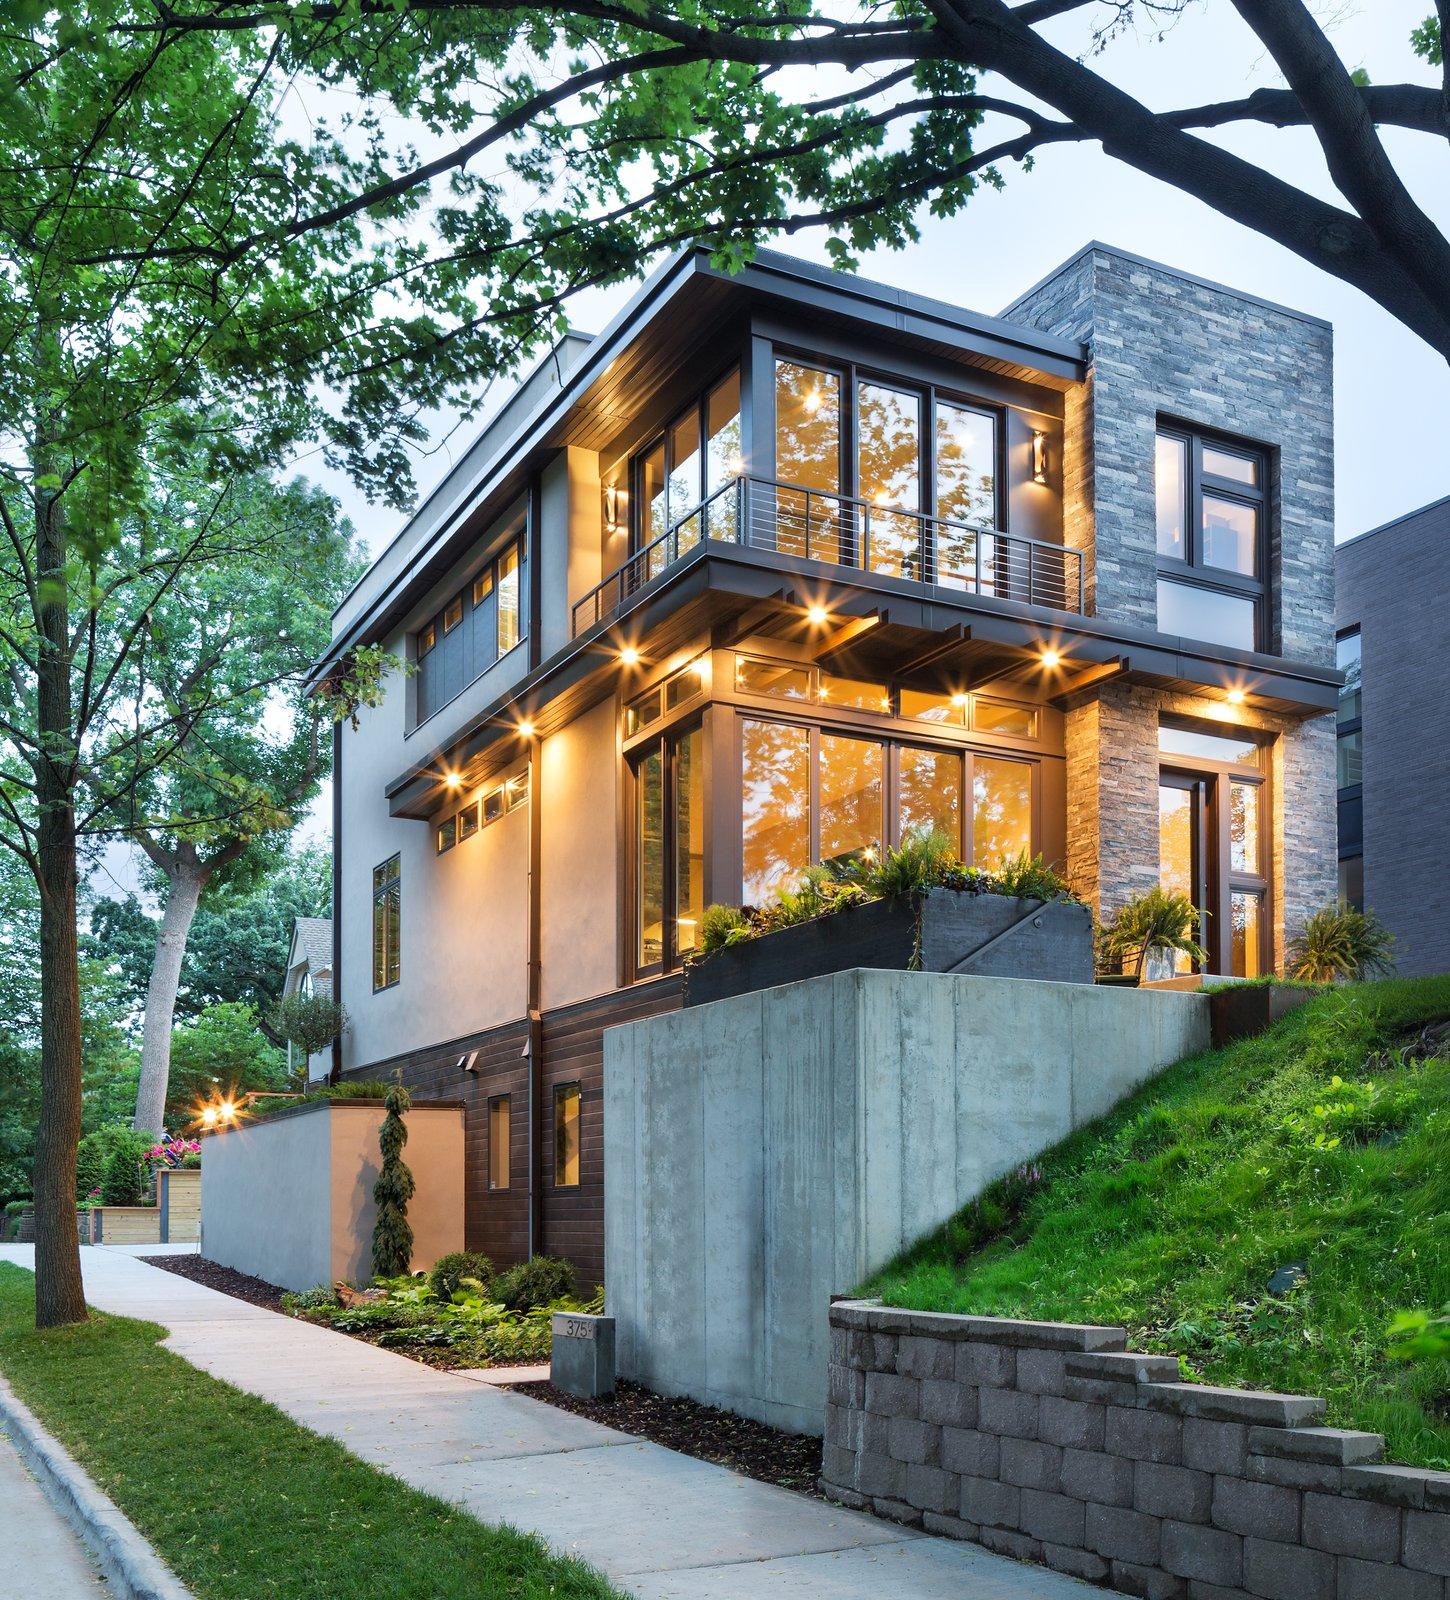 Exterior and House Building Type Builder John Kraemer & Sons' Lake Calhoun Organic Modern residence, winner of 2016 Integrity Red Diamond Achiever Award  Lake Calhoun Organic Modern